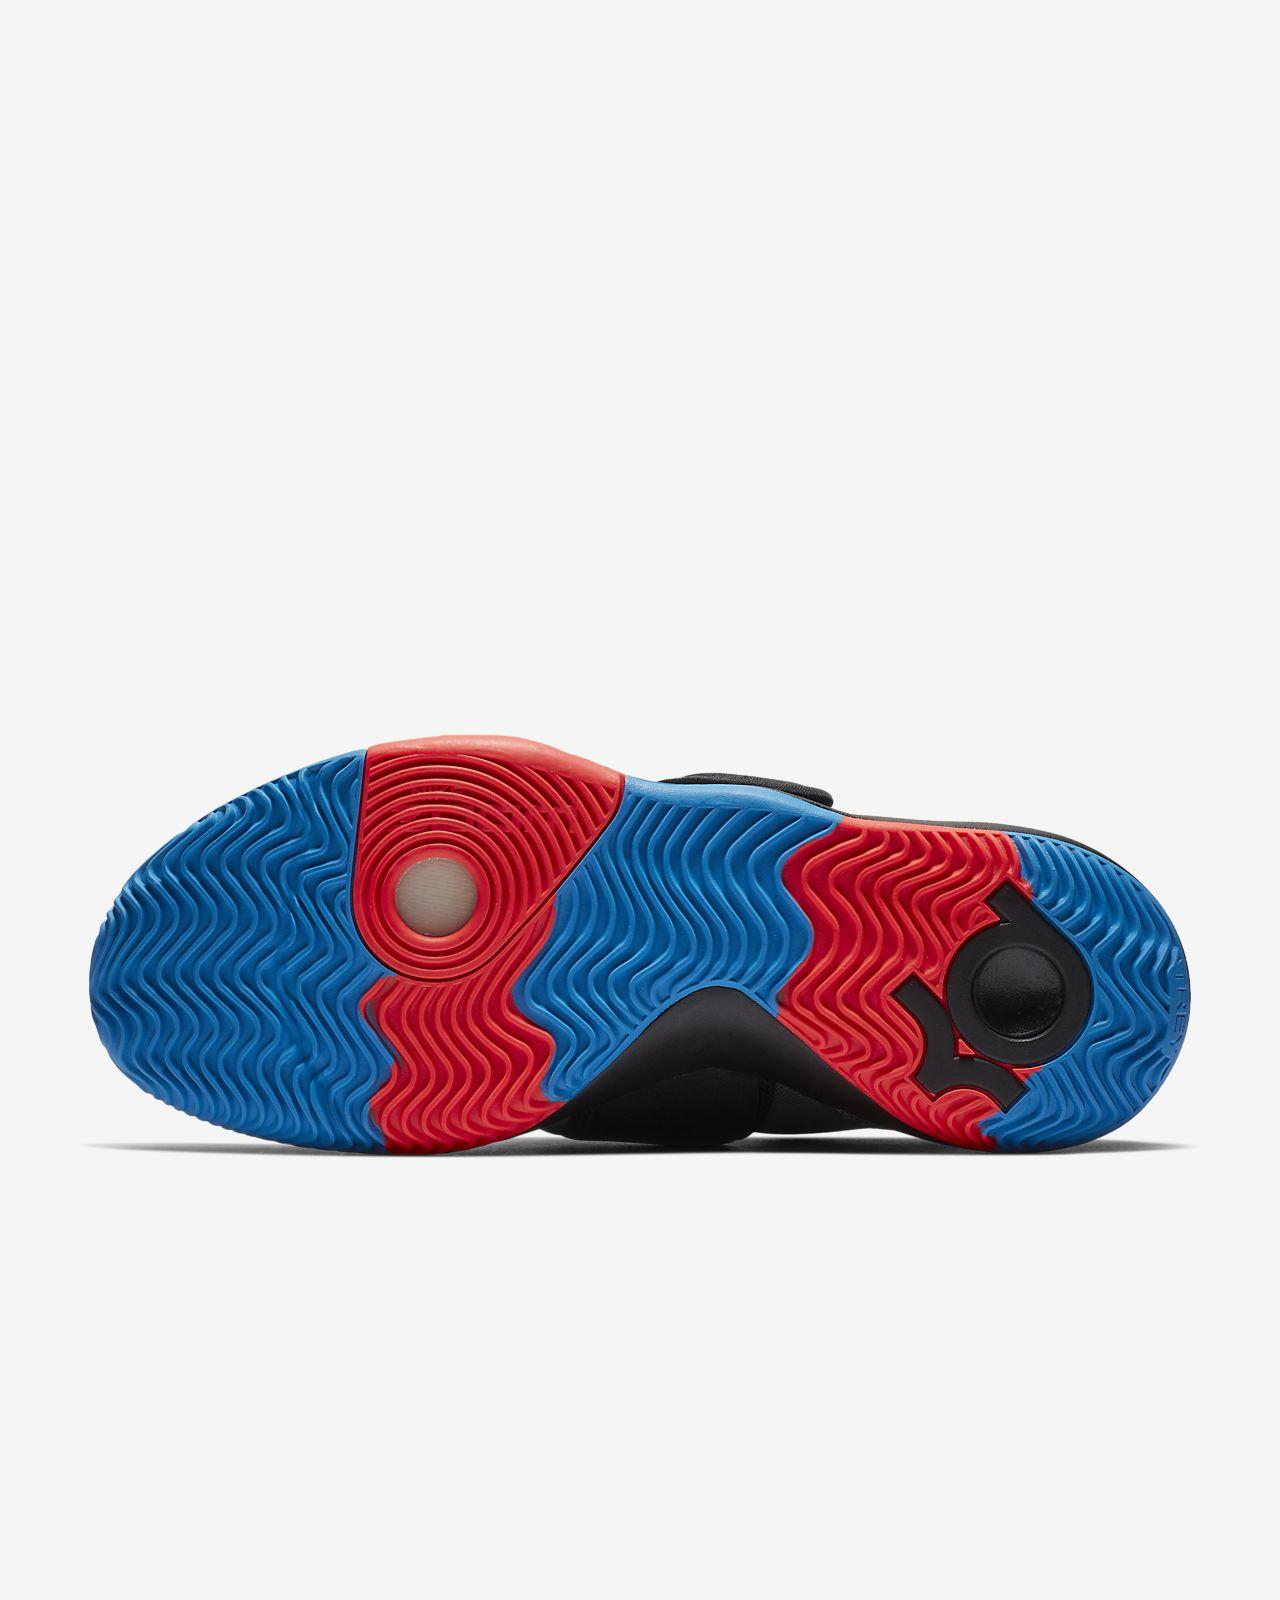 4cc34a53b9 Nike KD Trey 5 VI Basketball Shoe. Nike.com